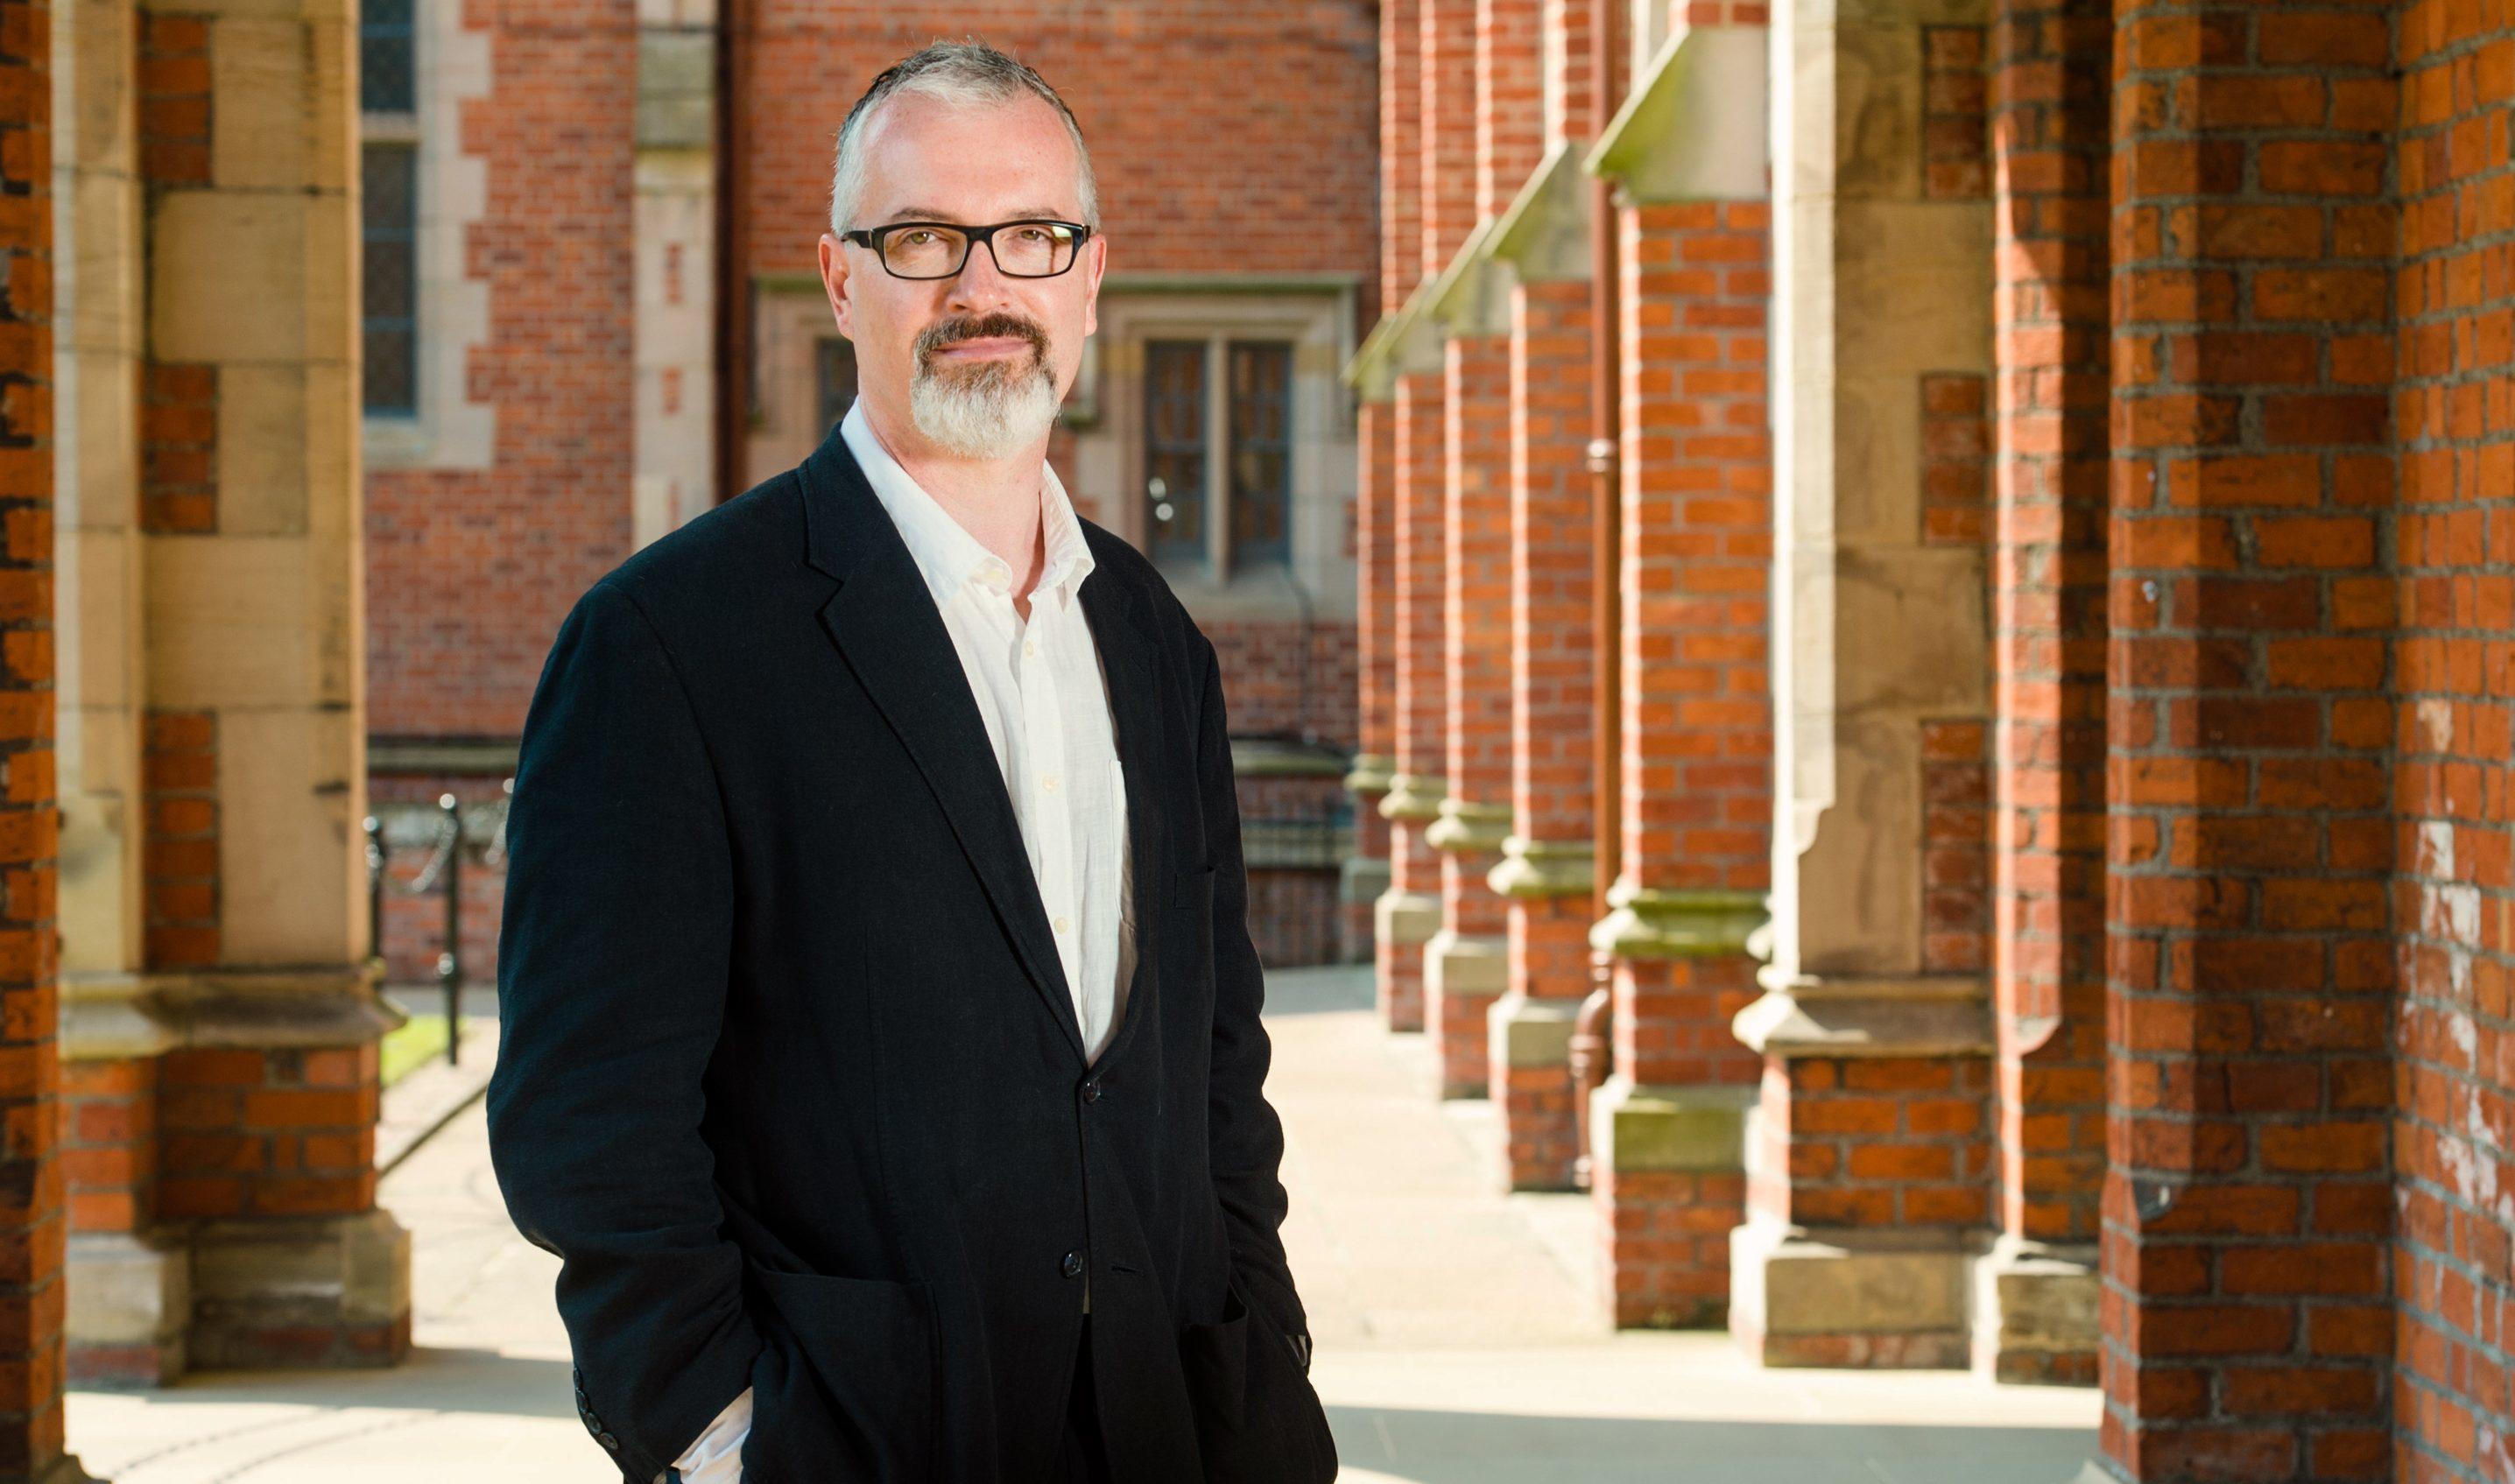 Renowned terrorism expert Professor Richard English